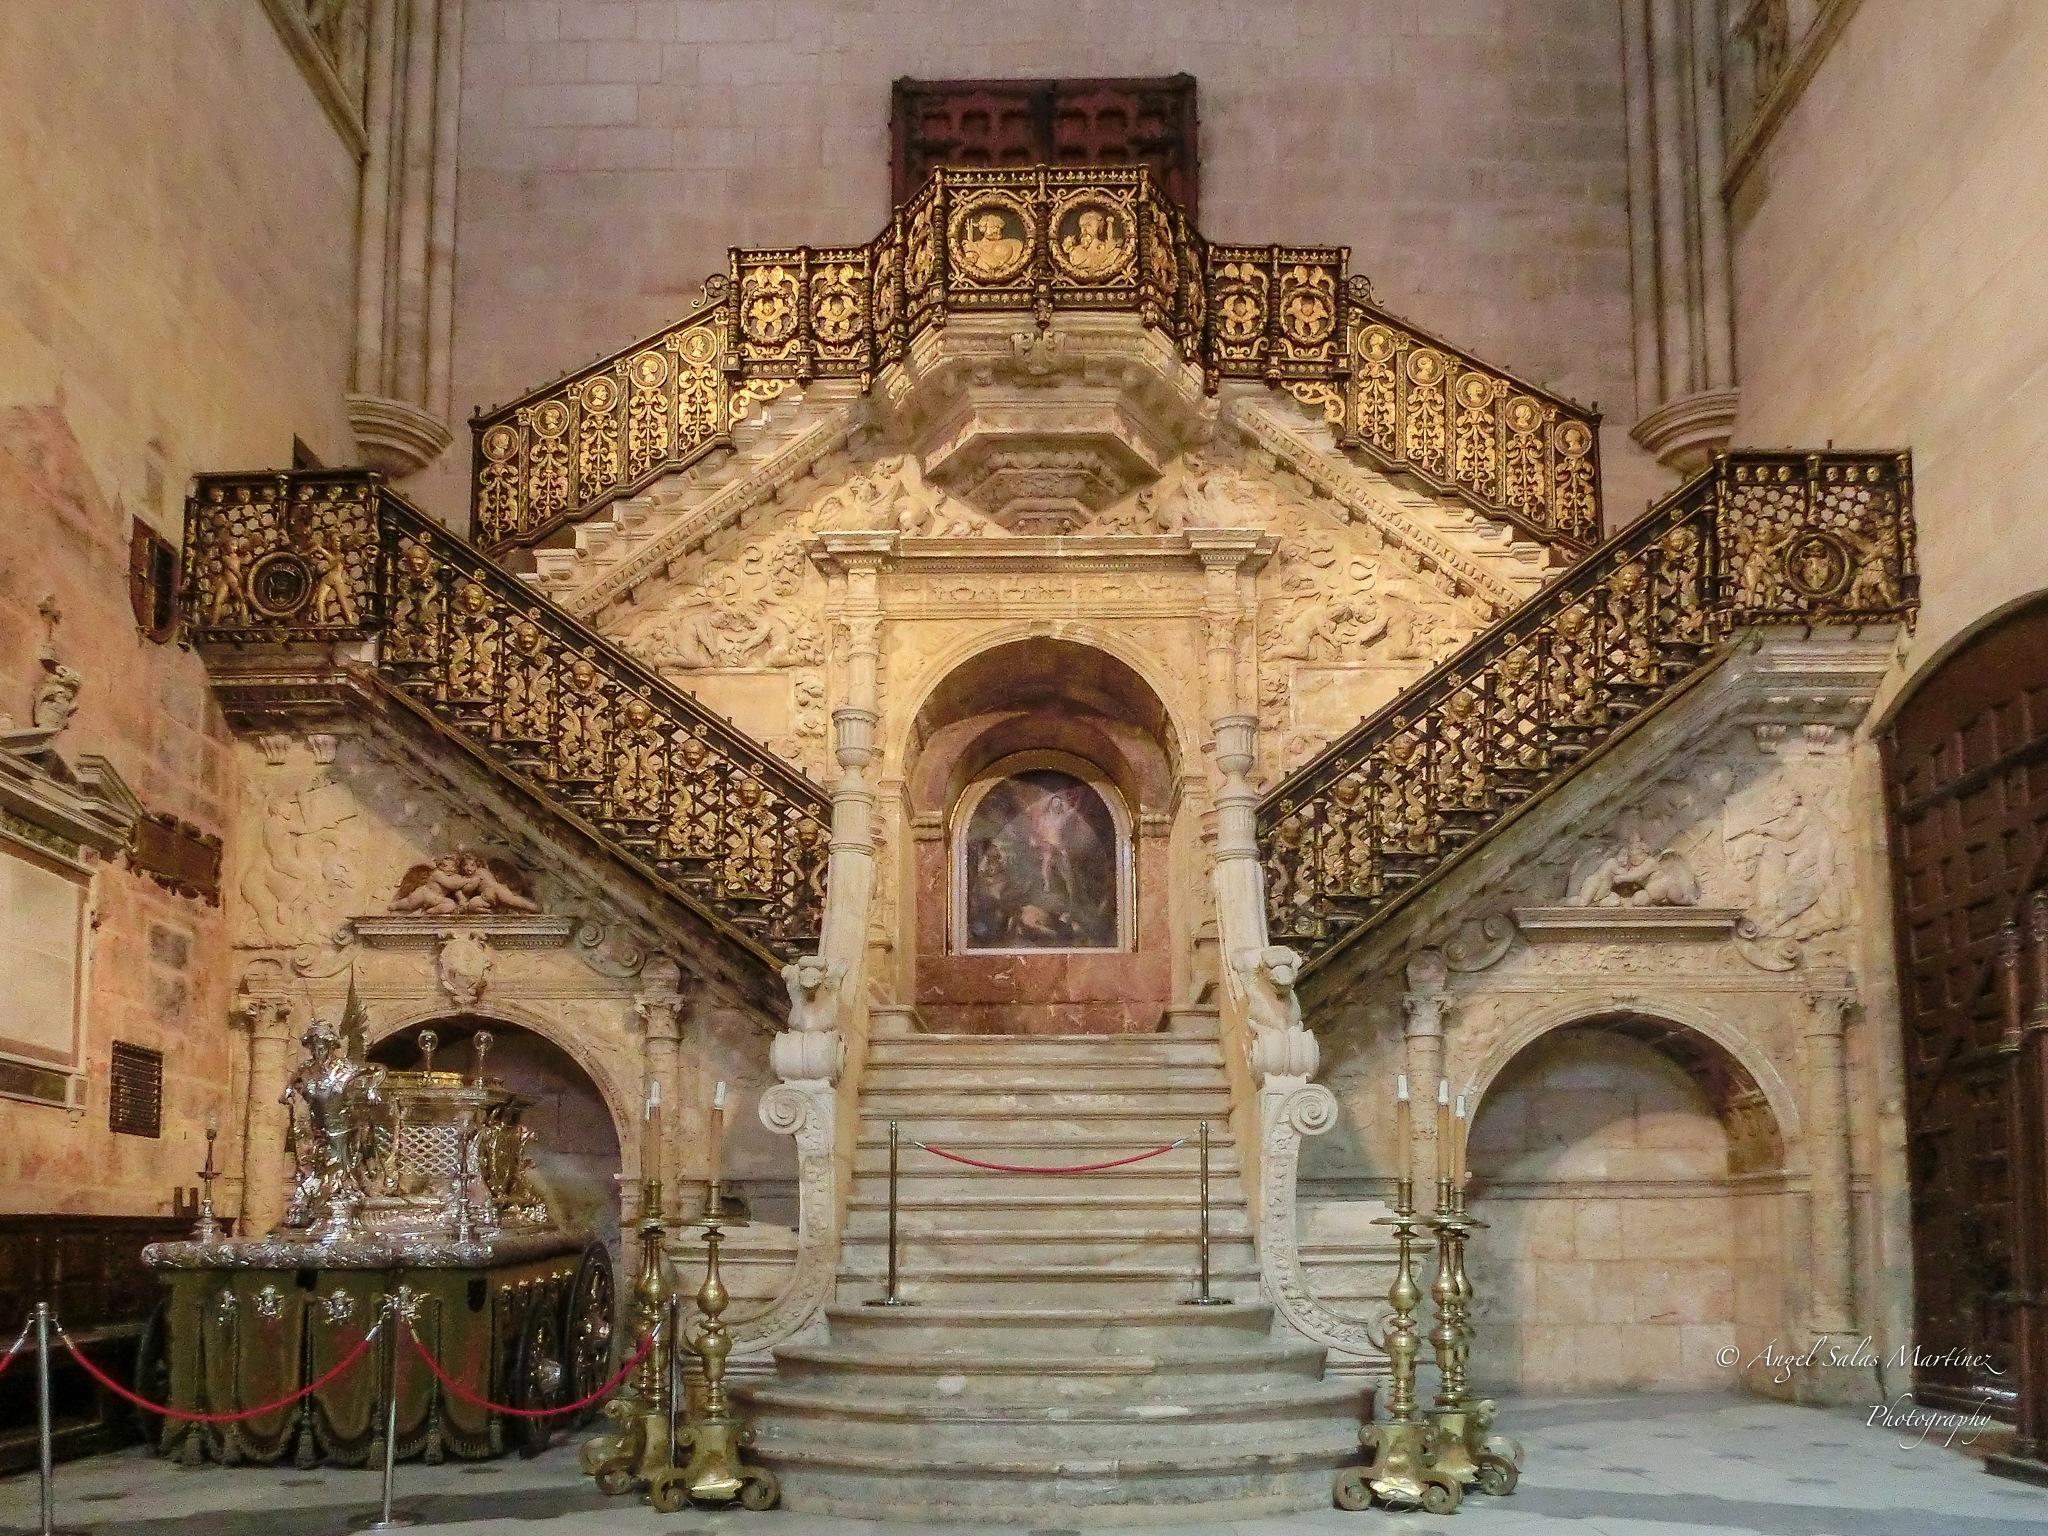 Escalera Dorada by Ángel Salas Martínez